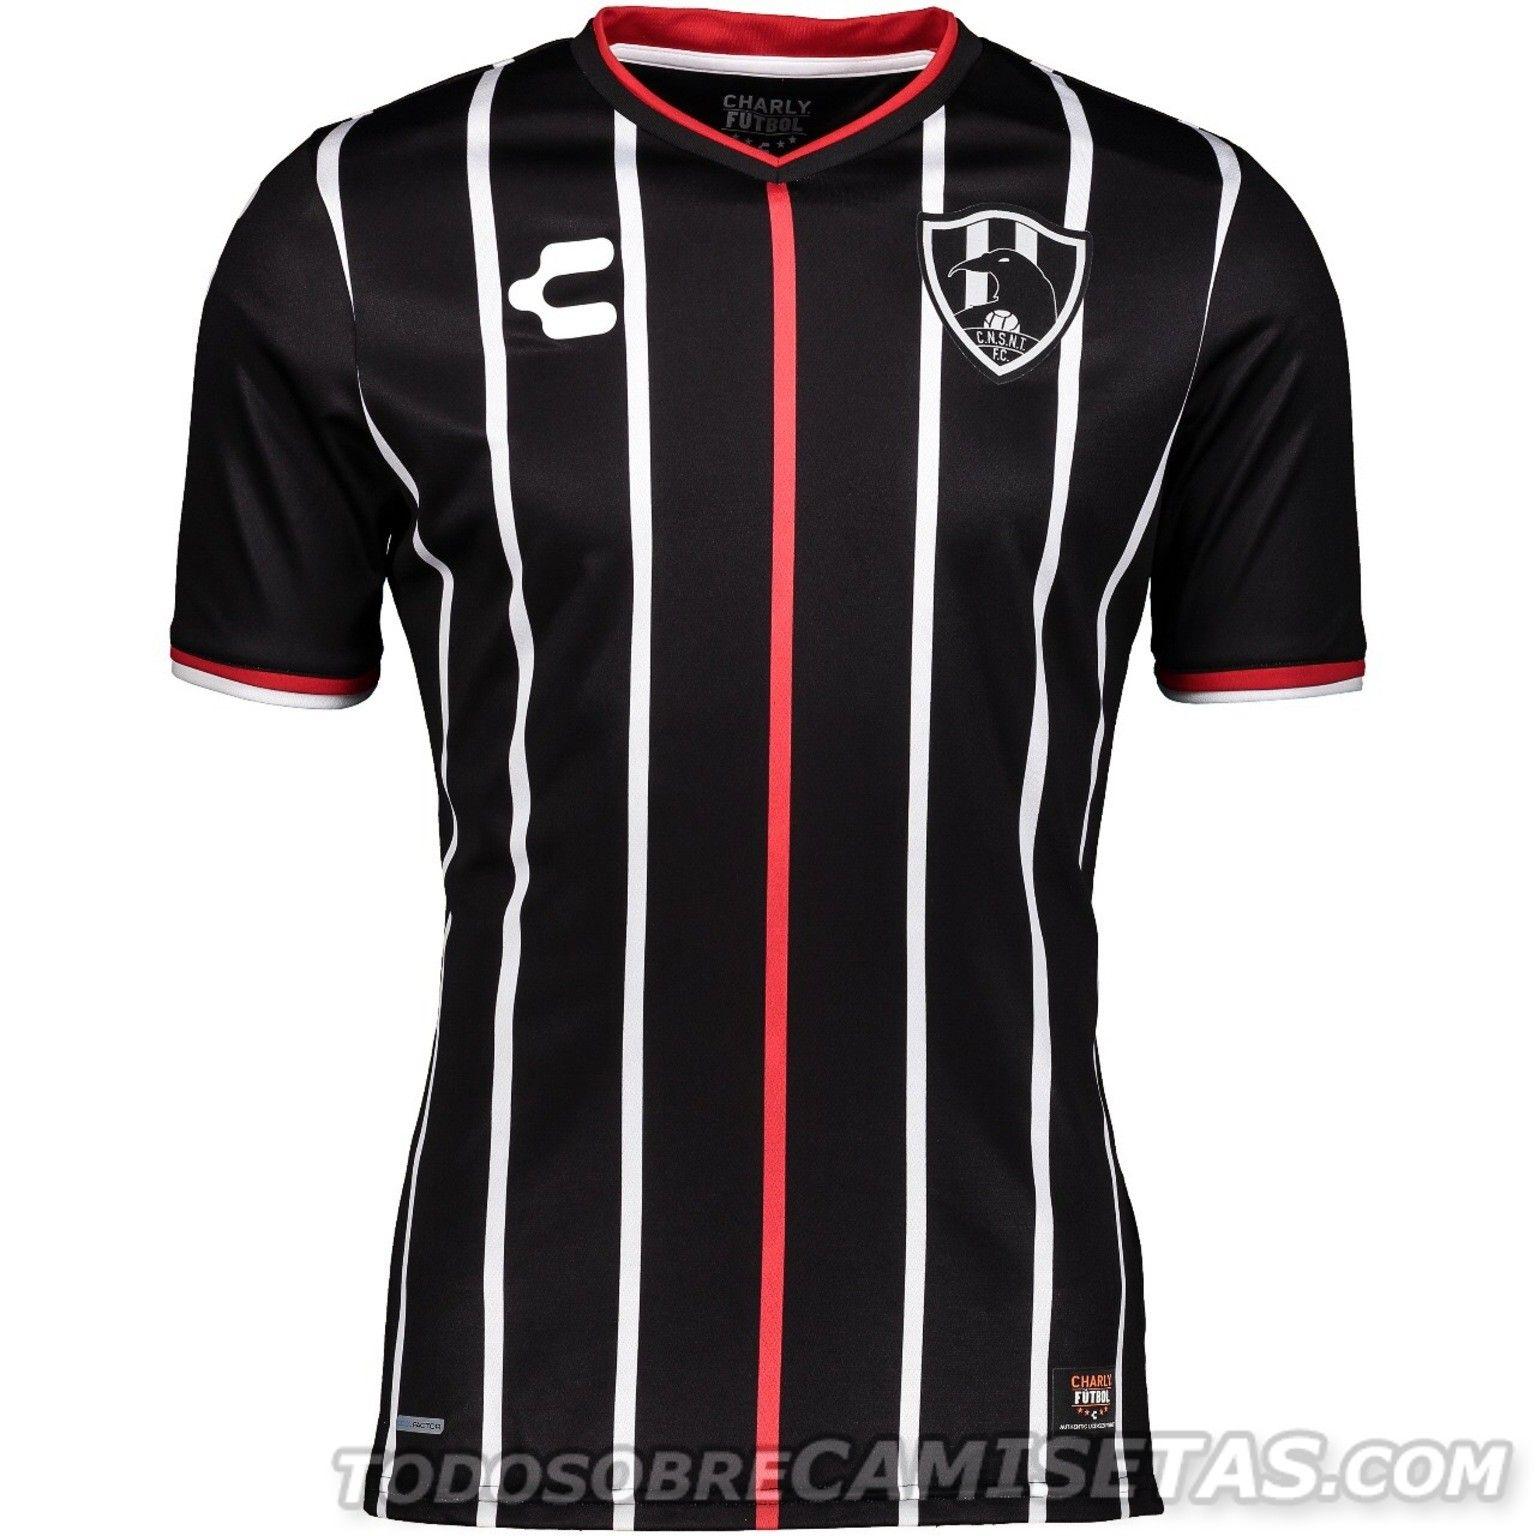 Jerseys Charly Futbol de Club de Cuervos Temporada 3 Soccer Jerseys 51c8486242c12